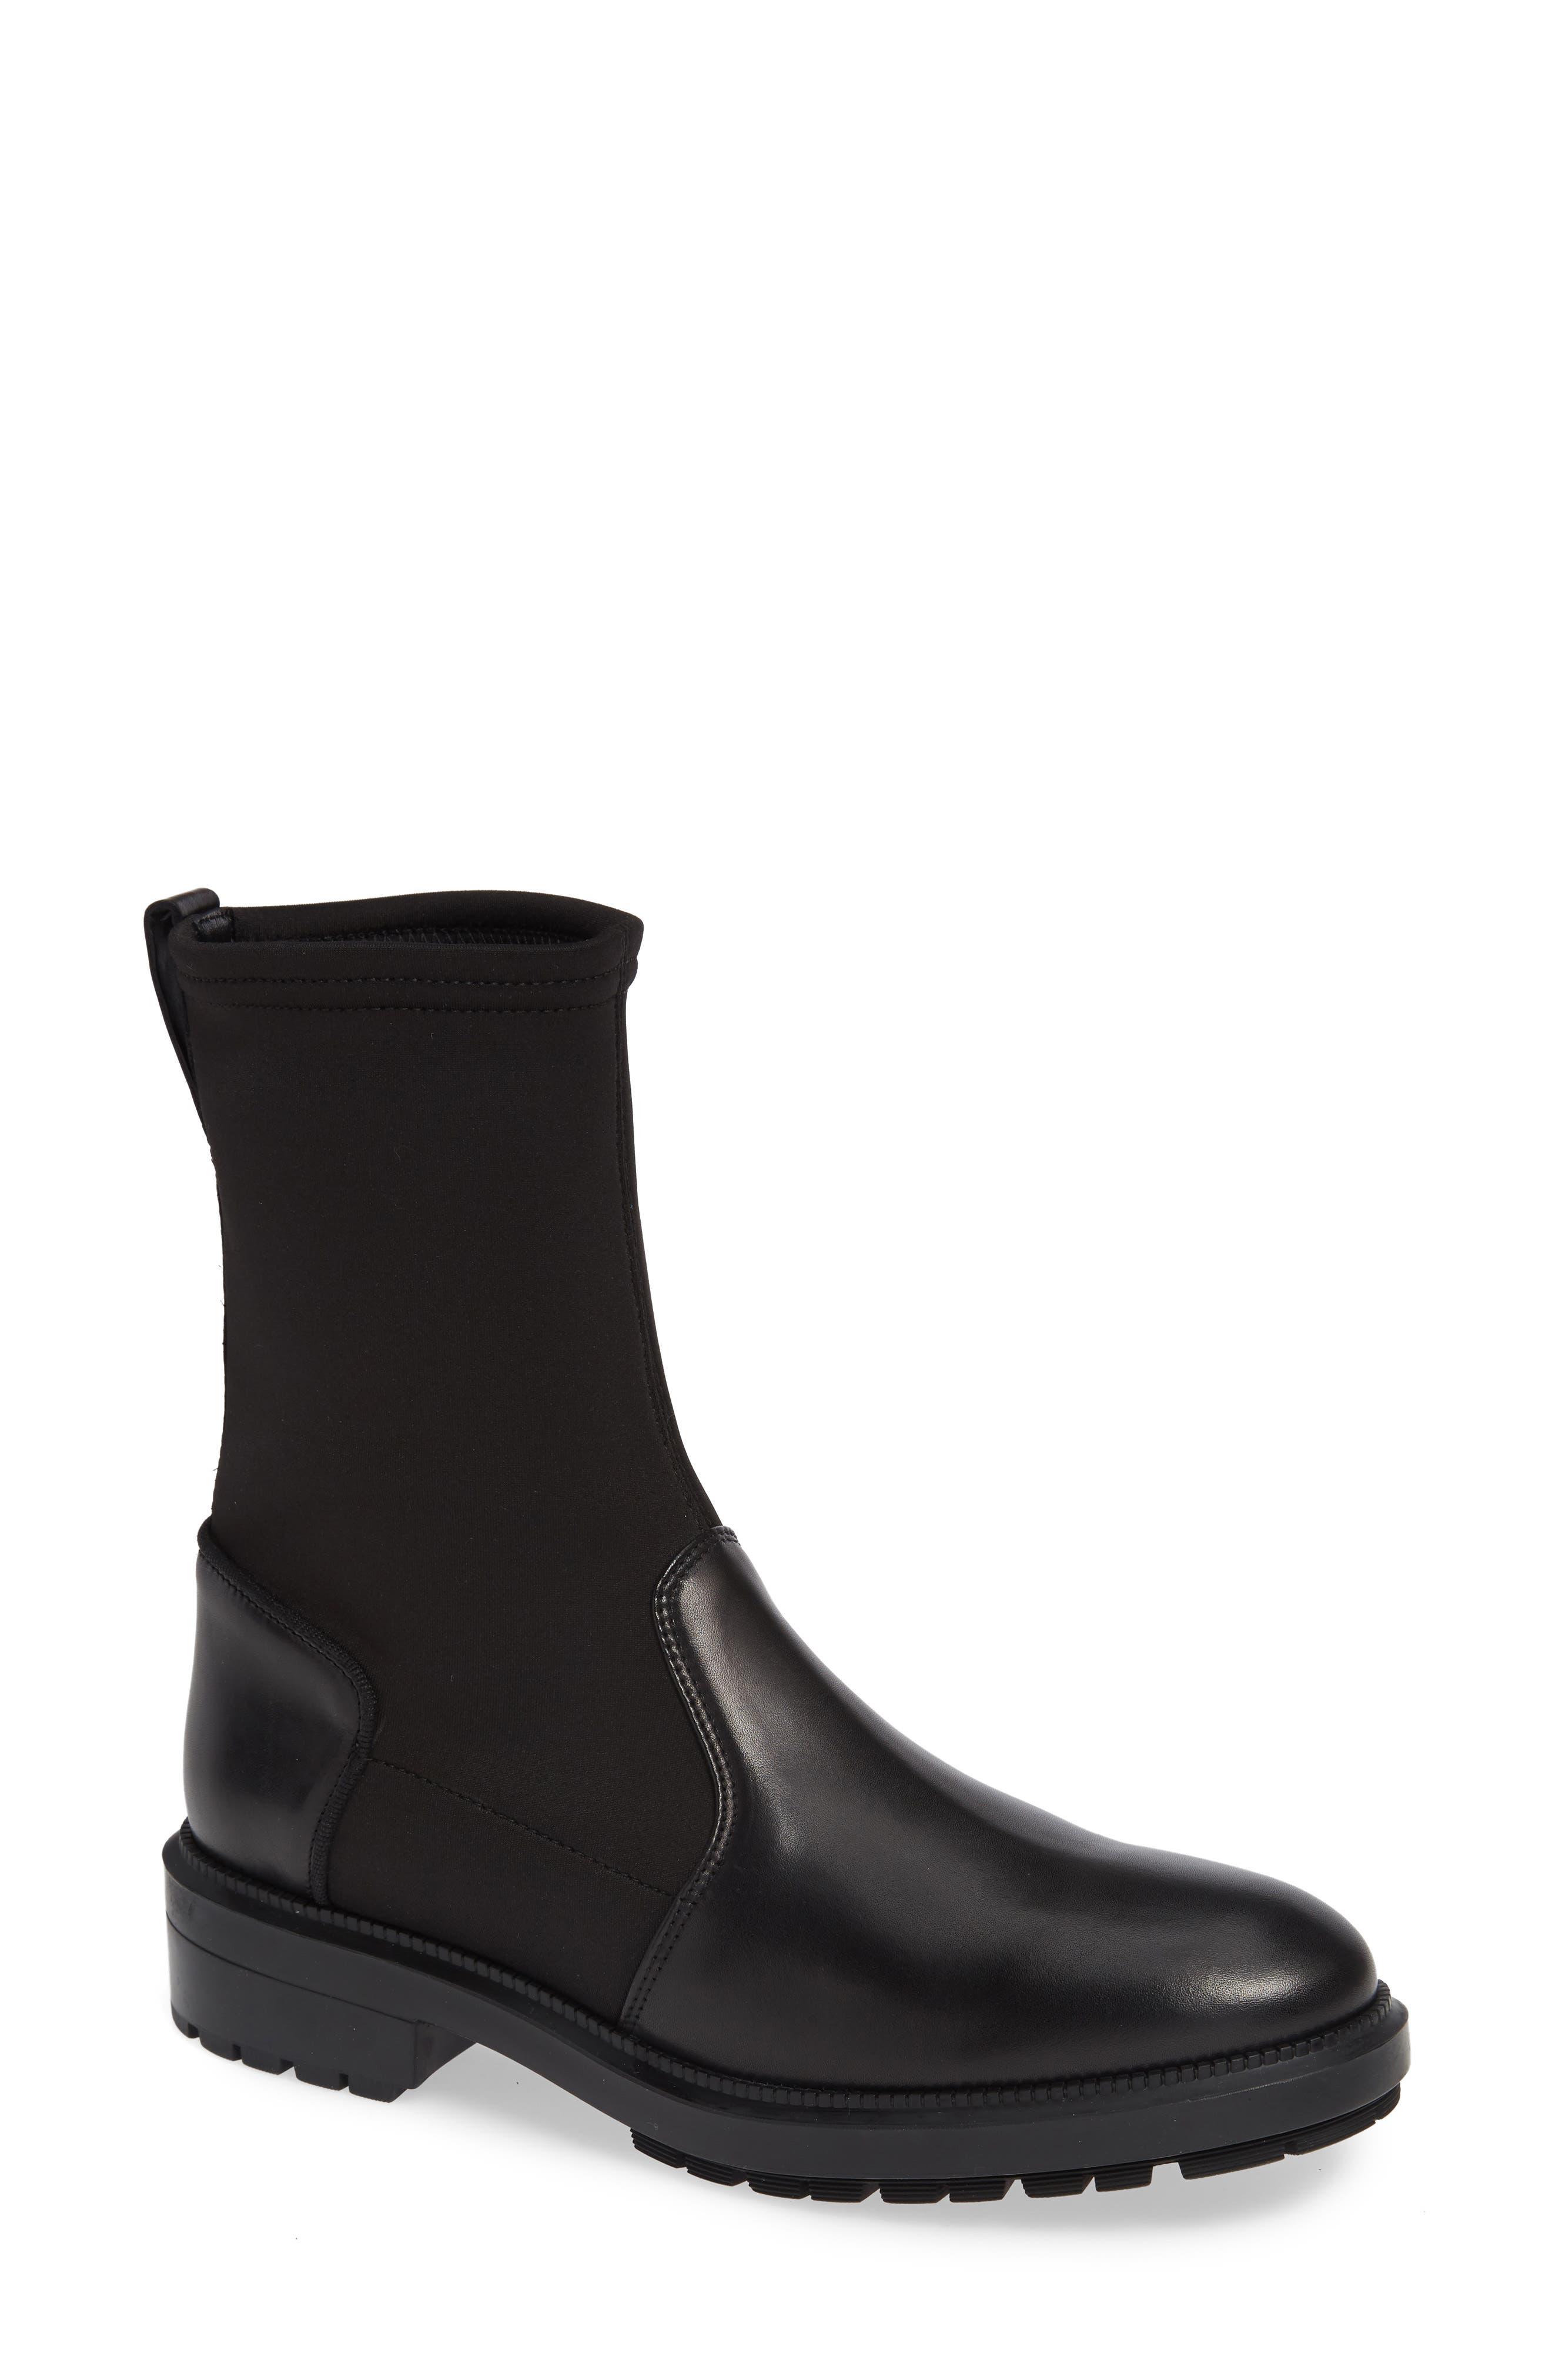 Aquatalia Leoda Ankle Water Resistant Boot- Black